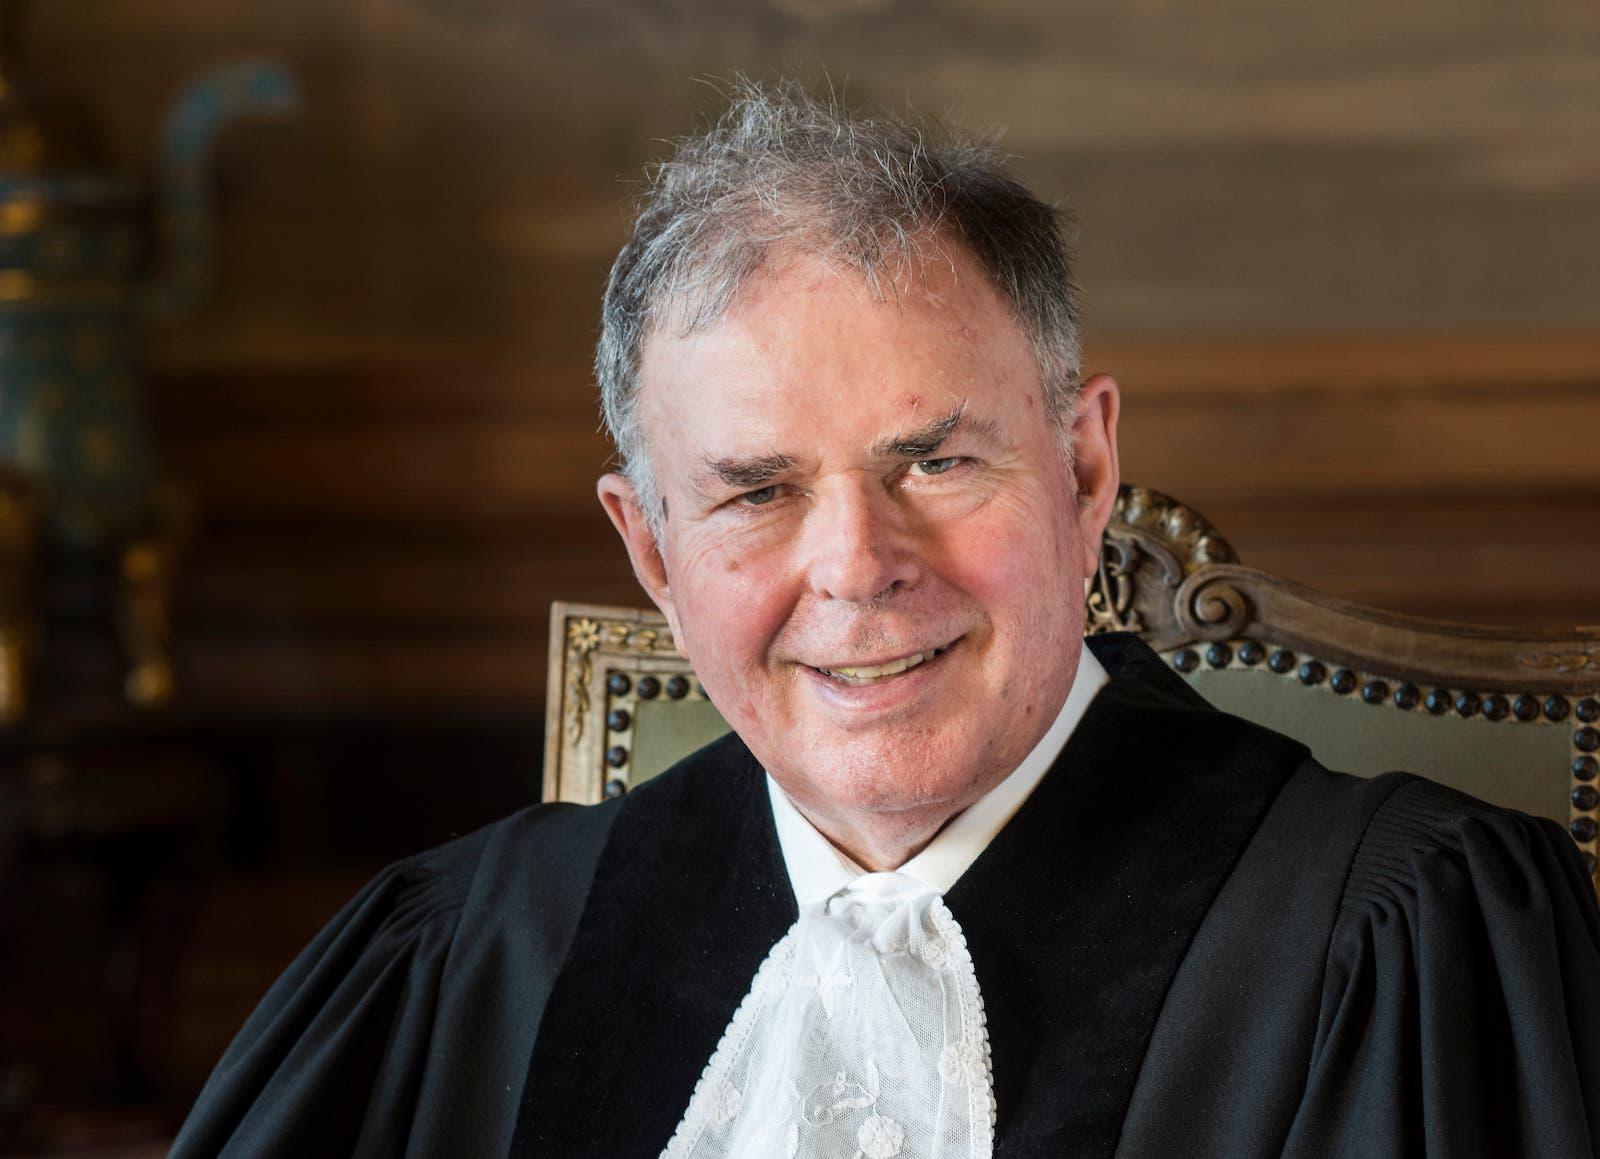 ICJ judge James Richard Crawford dies aged 72